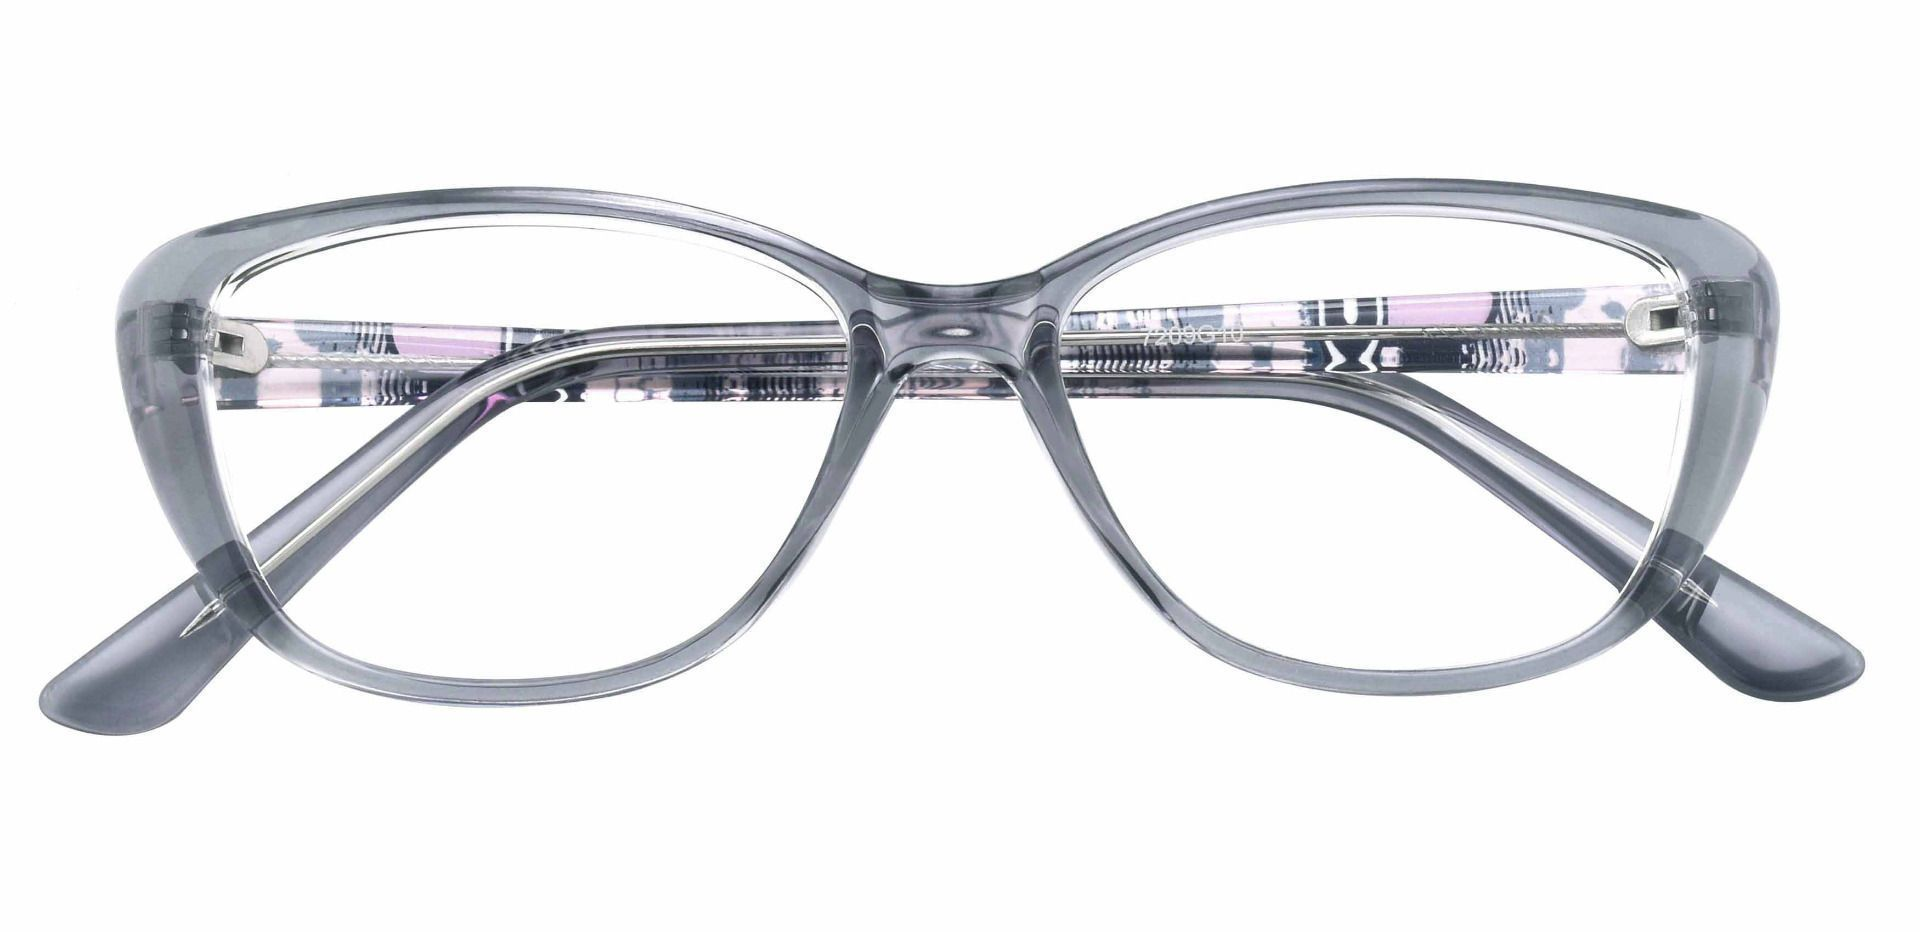 Sicily Cat Eye Prescription Glasses - Gray